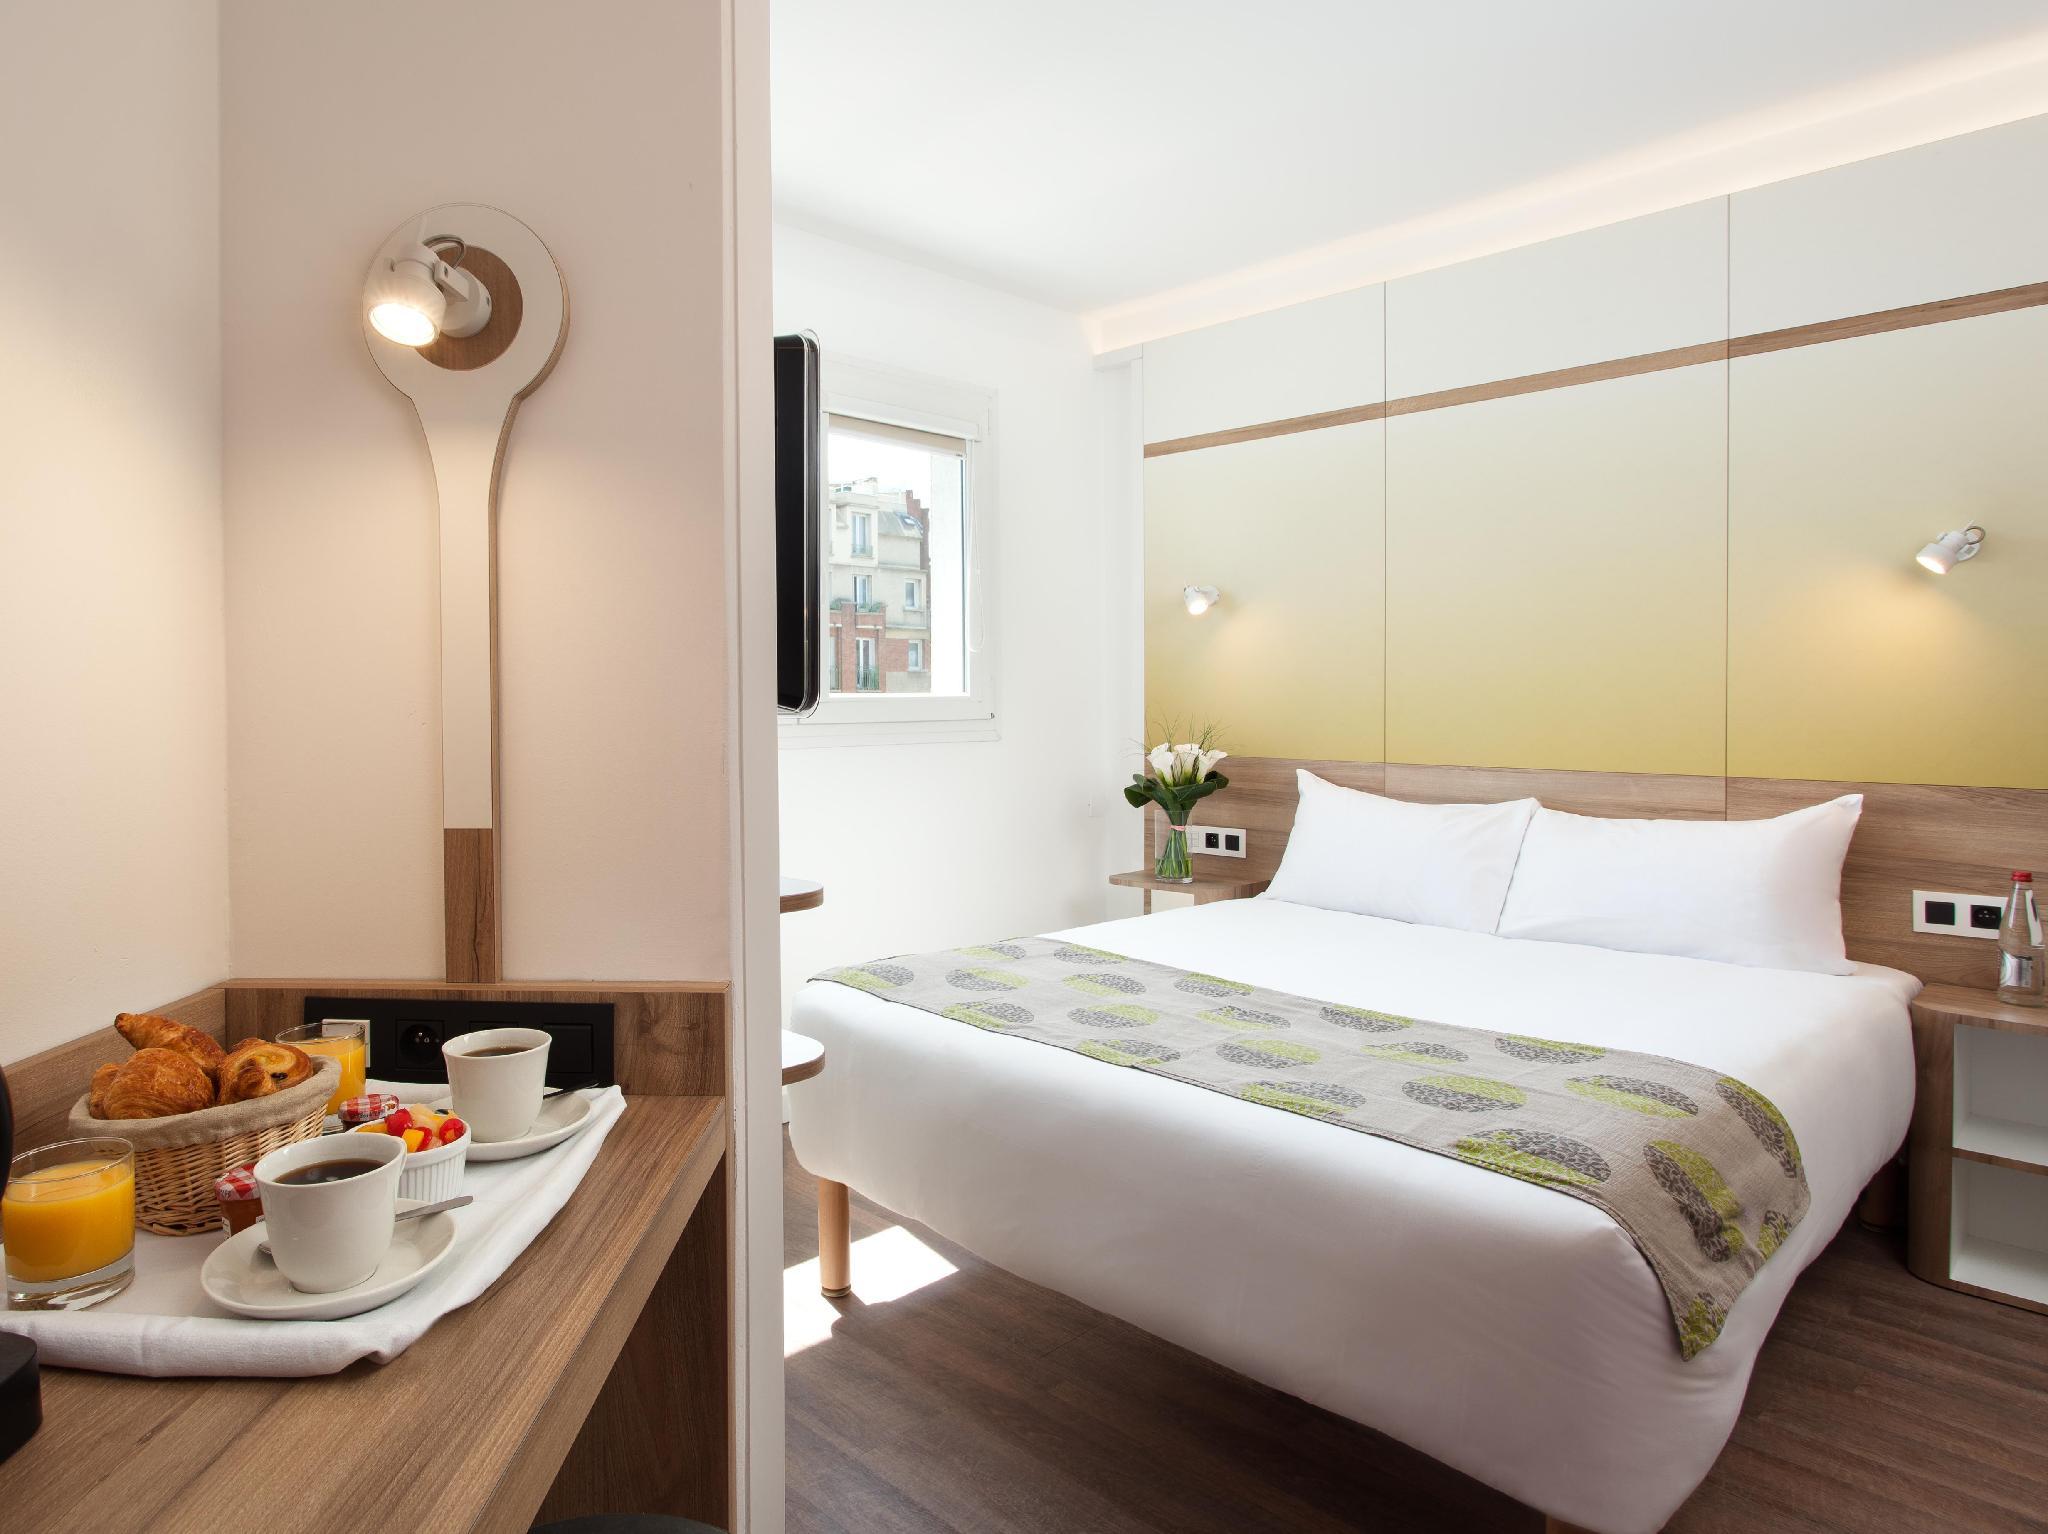 Median Paris Porte De Versailles Hotel - Hotell och Boende i Frankrike i Europa